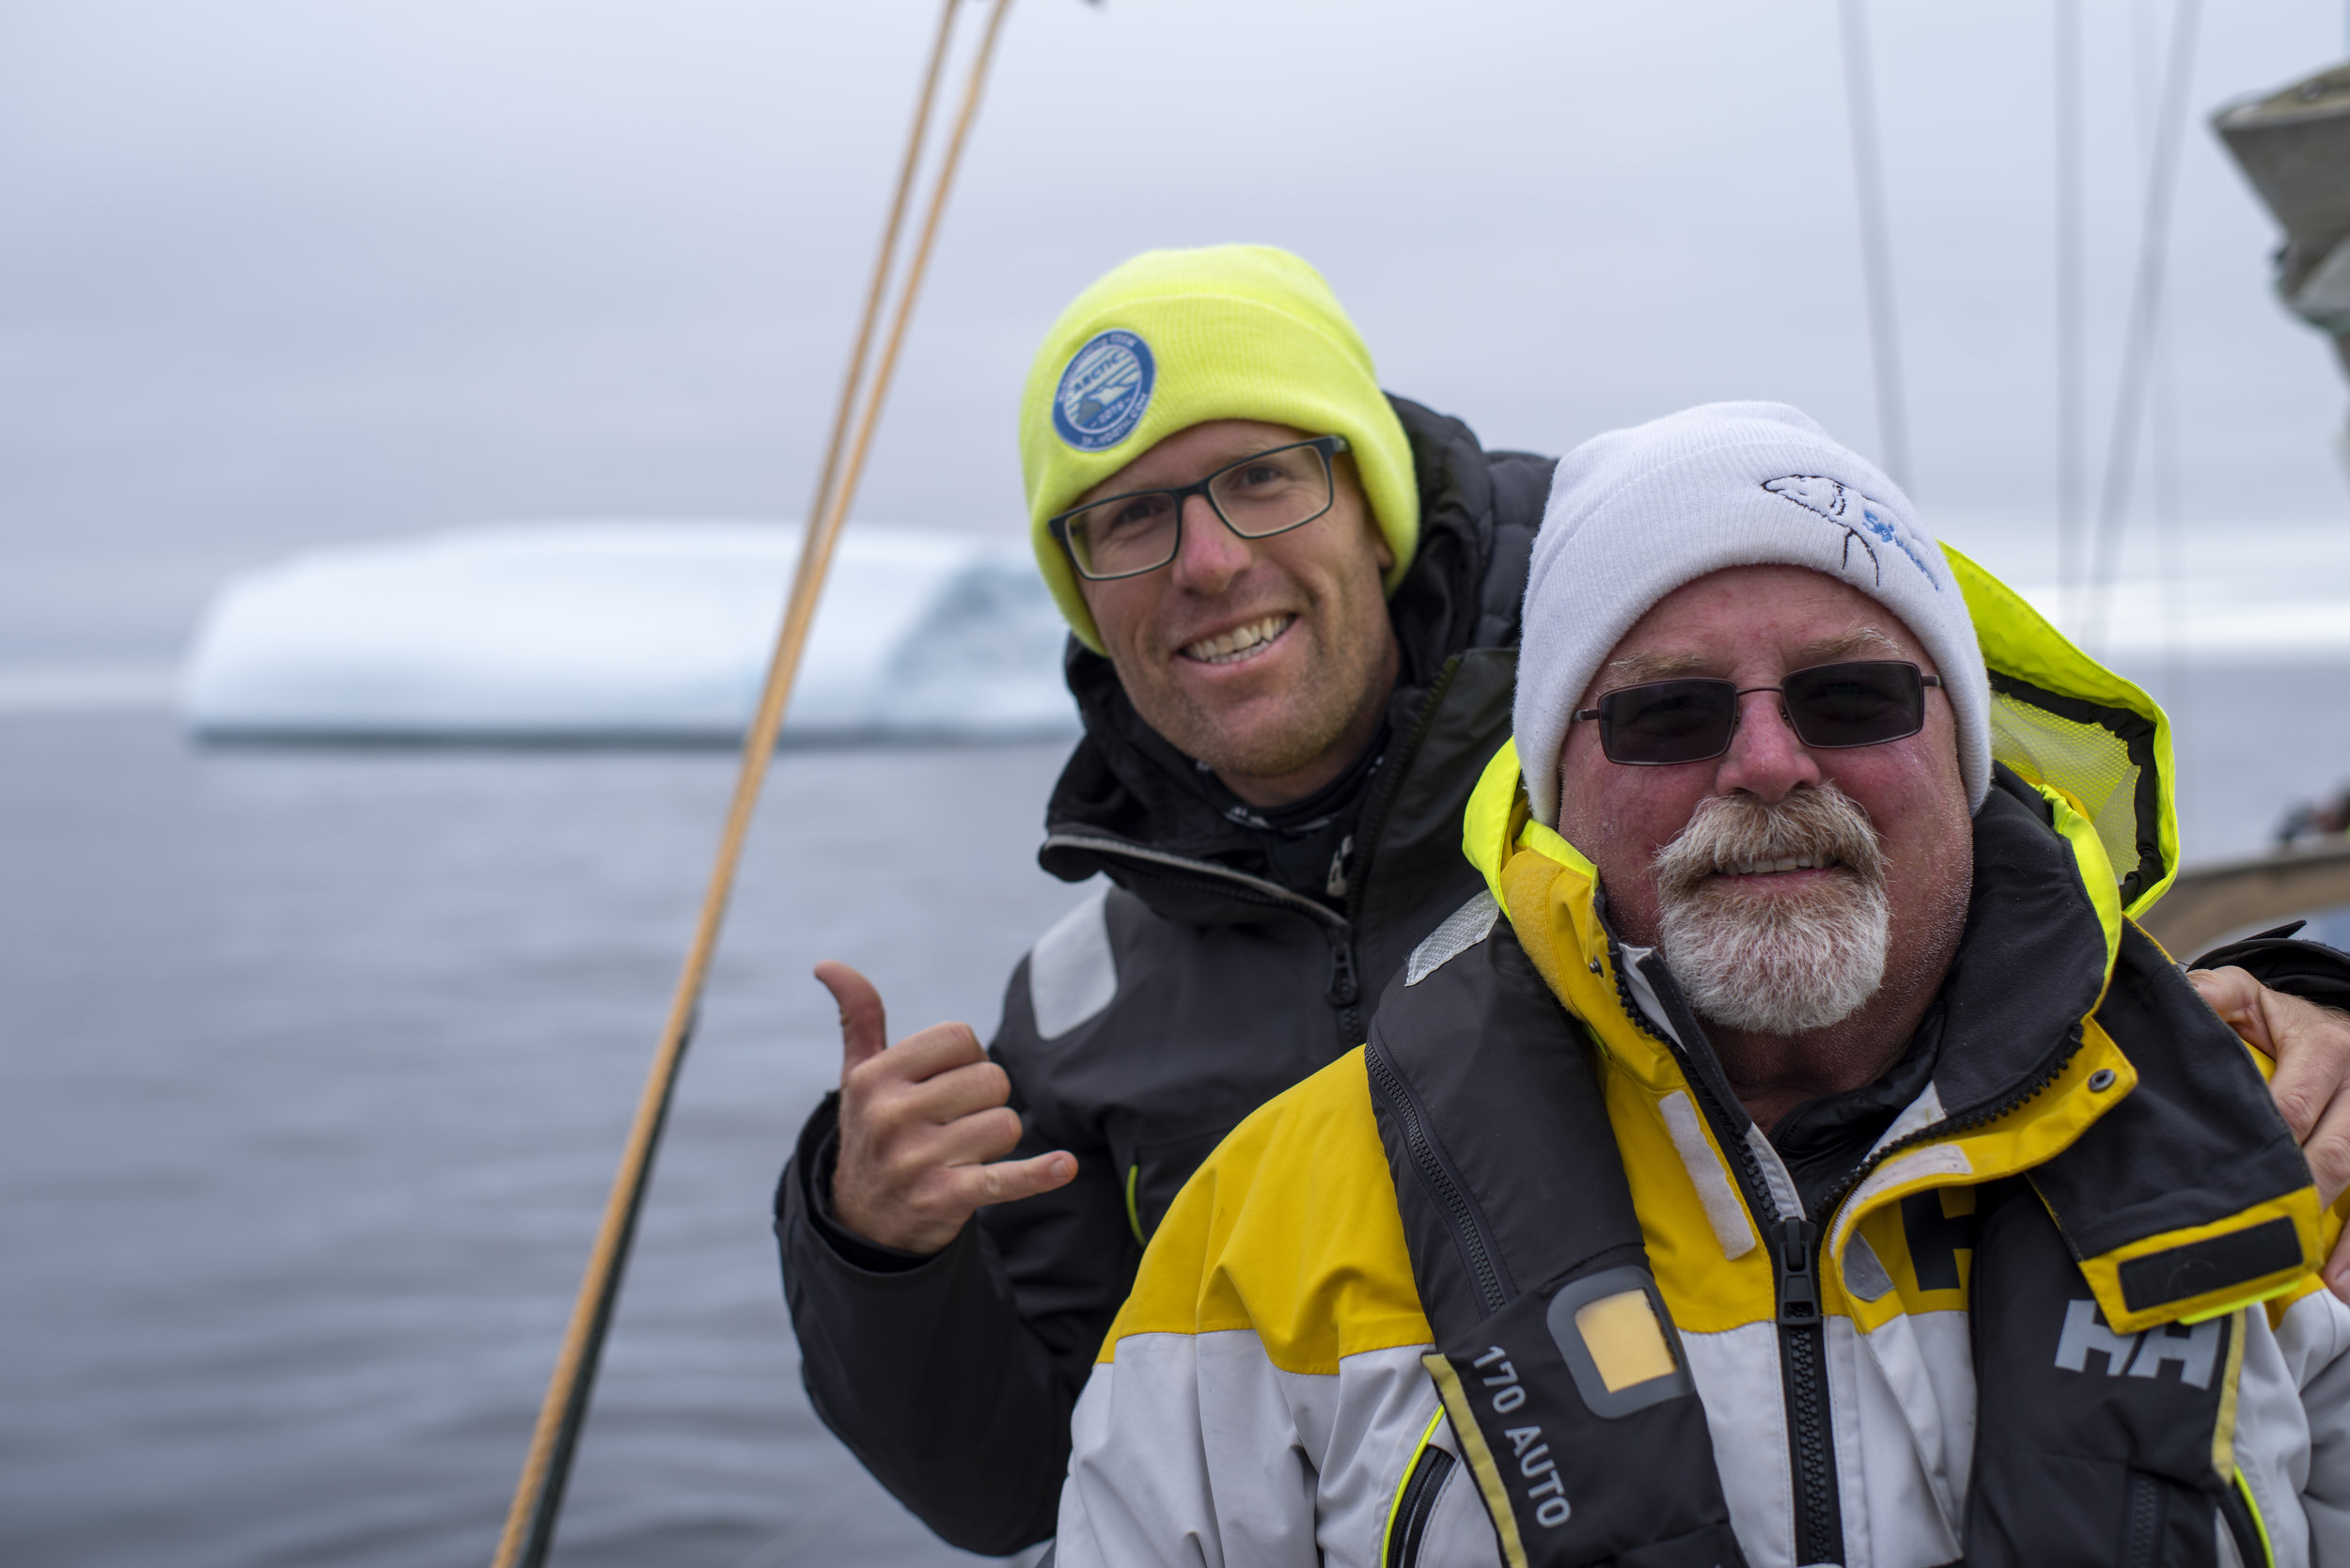 Dad got his iceberg on Day 1!